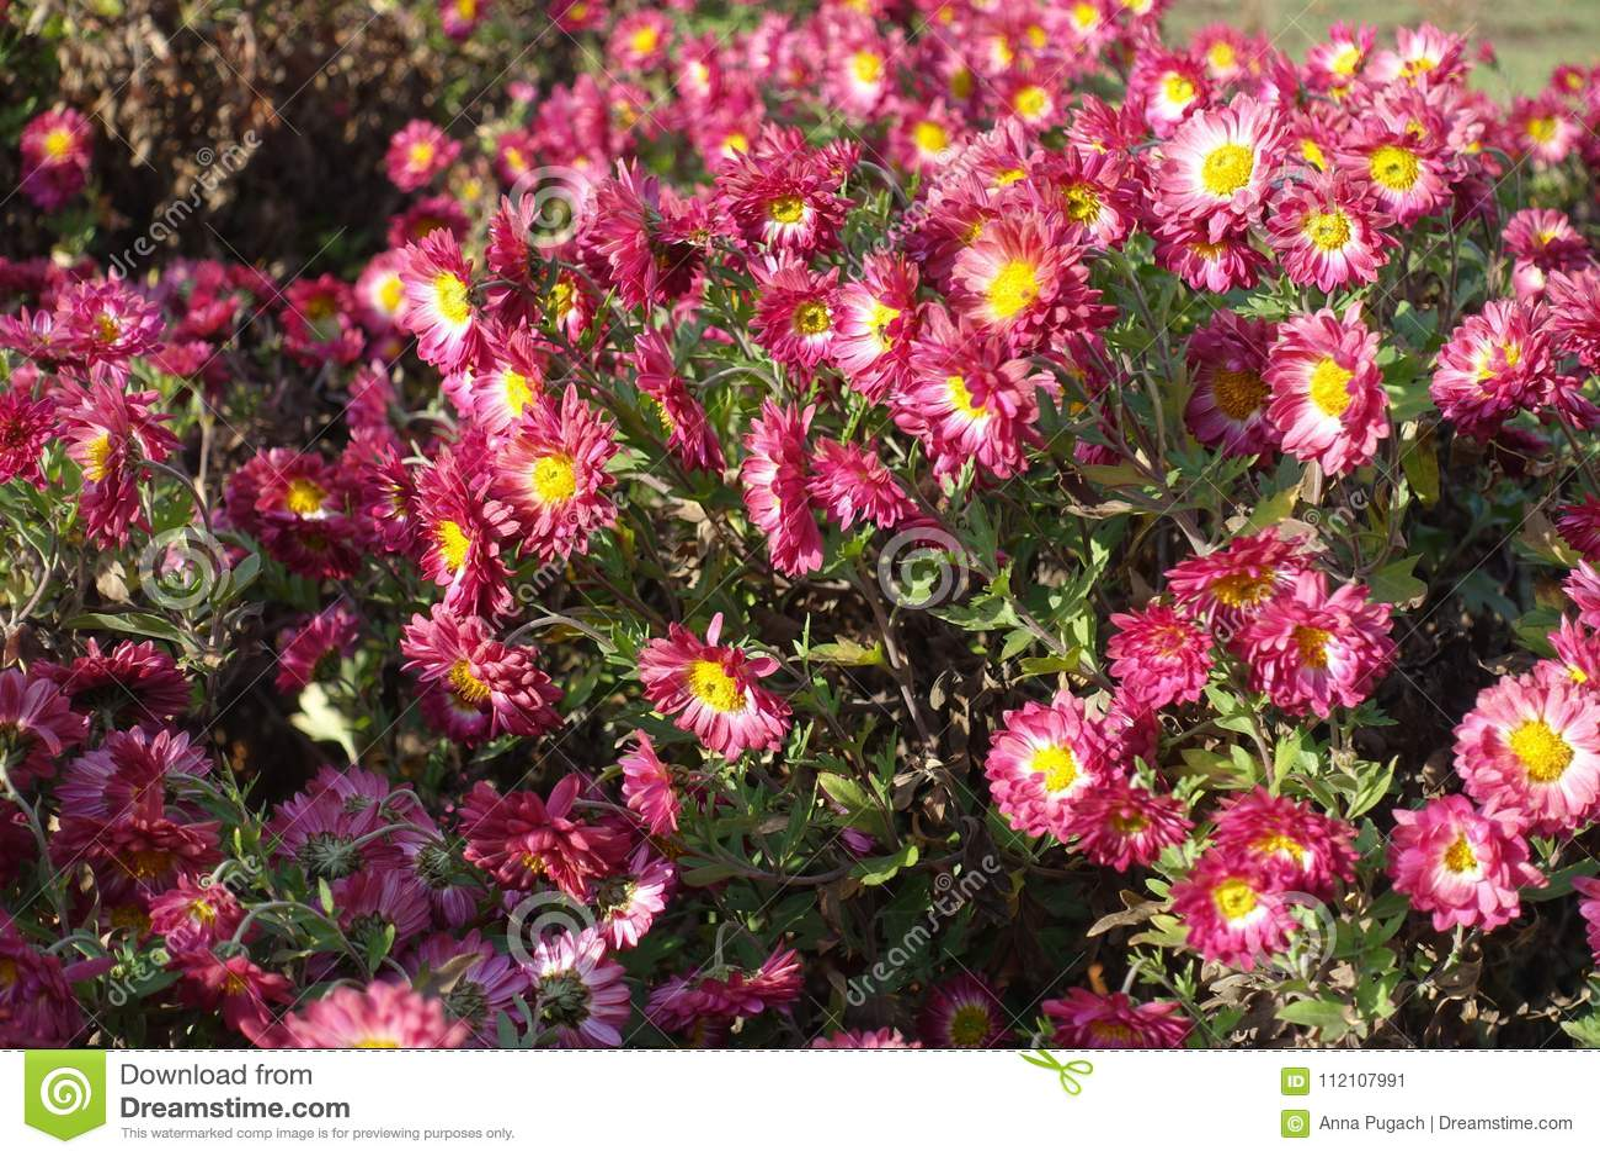 Cerise And White Daisy Like Flowers Of Chrysanthemum Stock Image